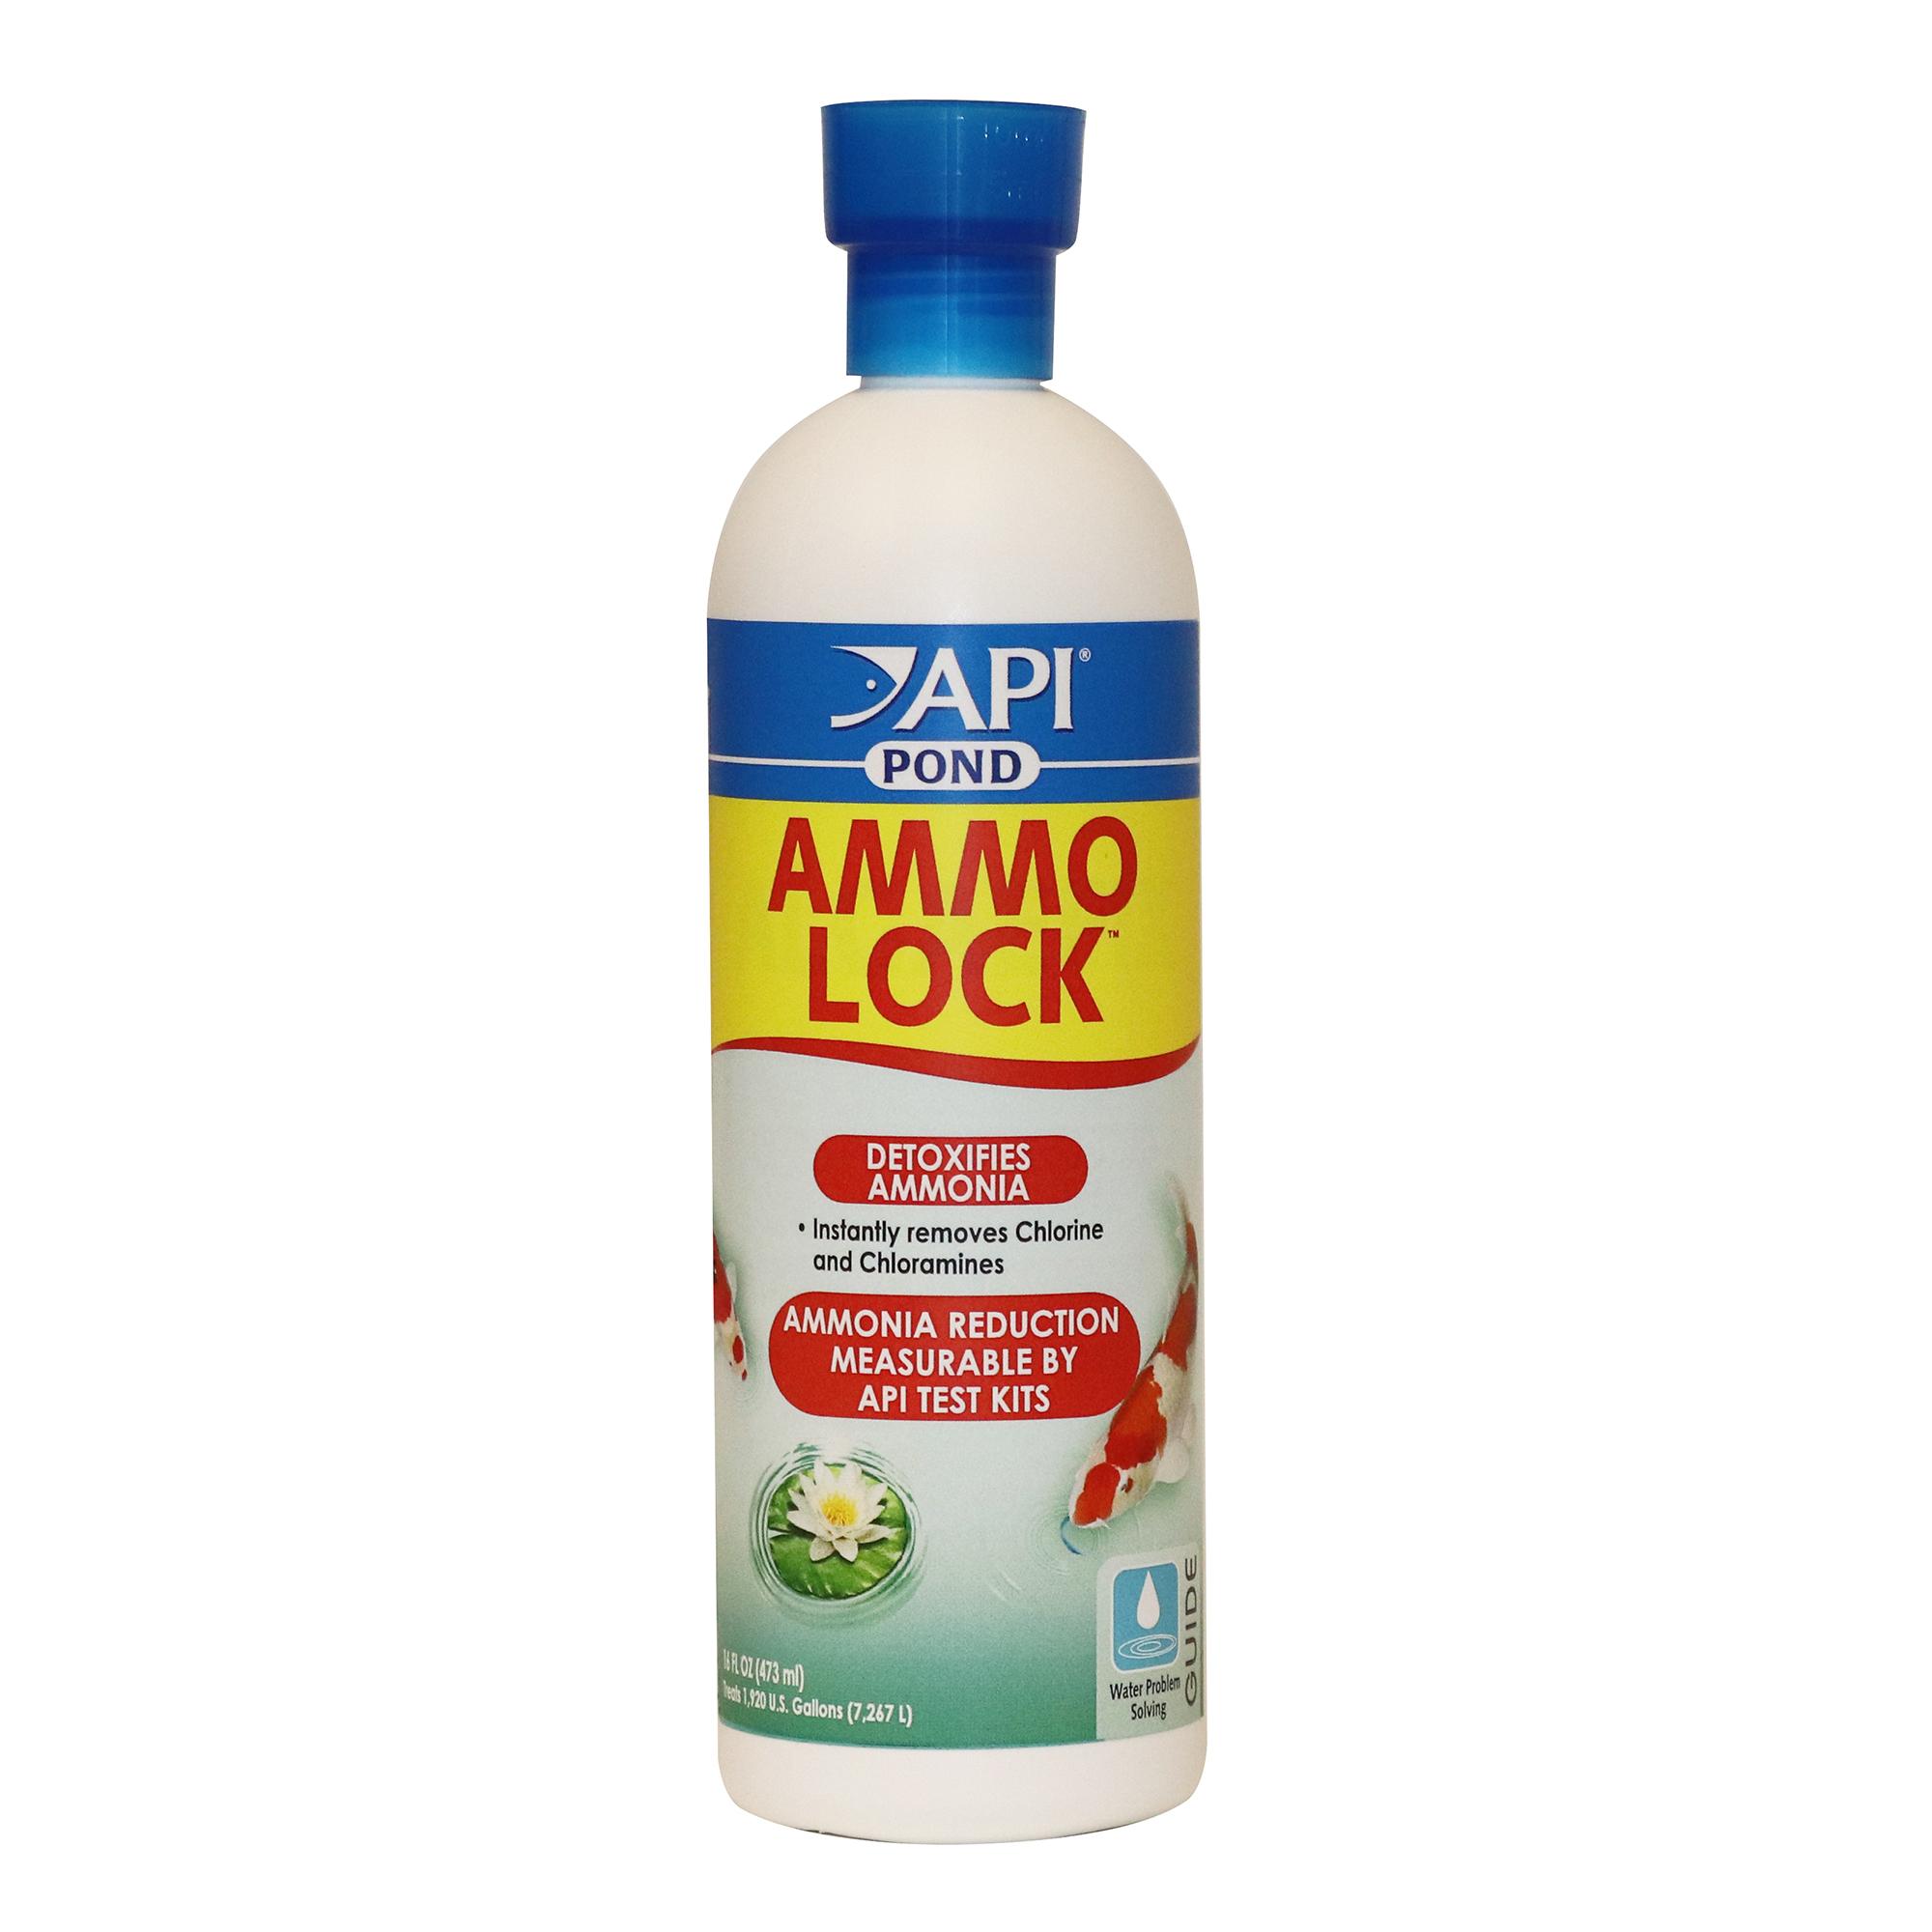 POND AMMO LOCK™